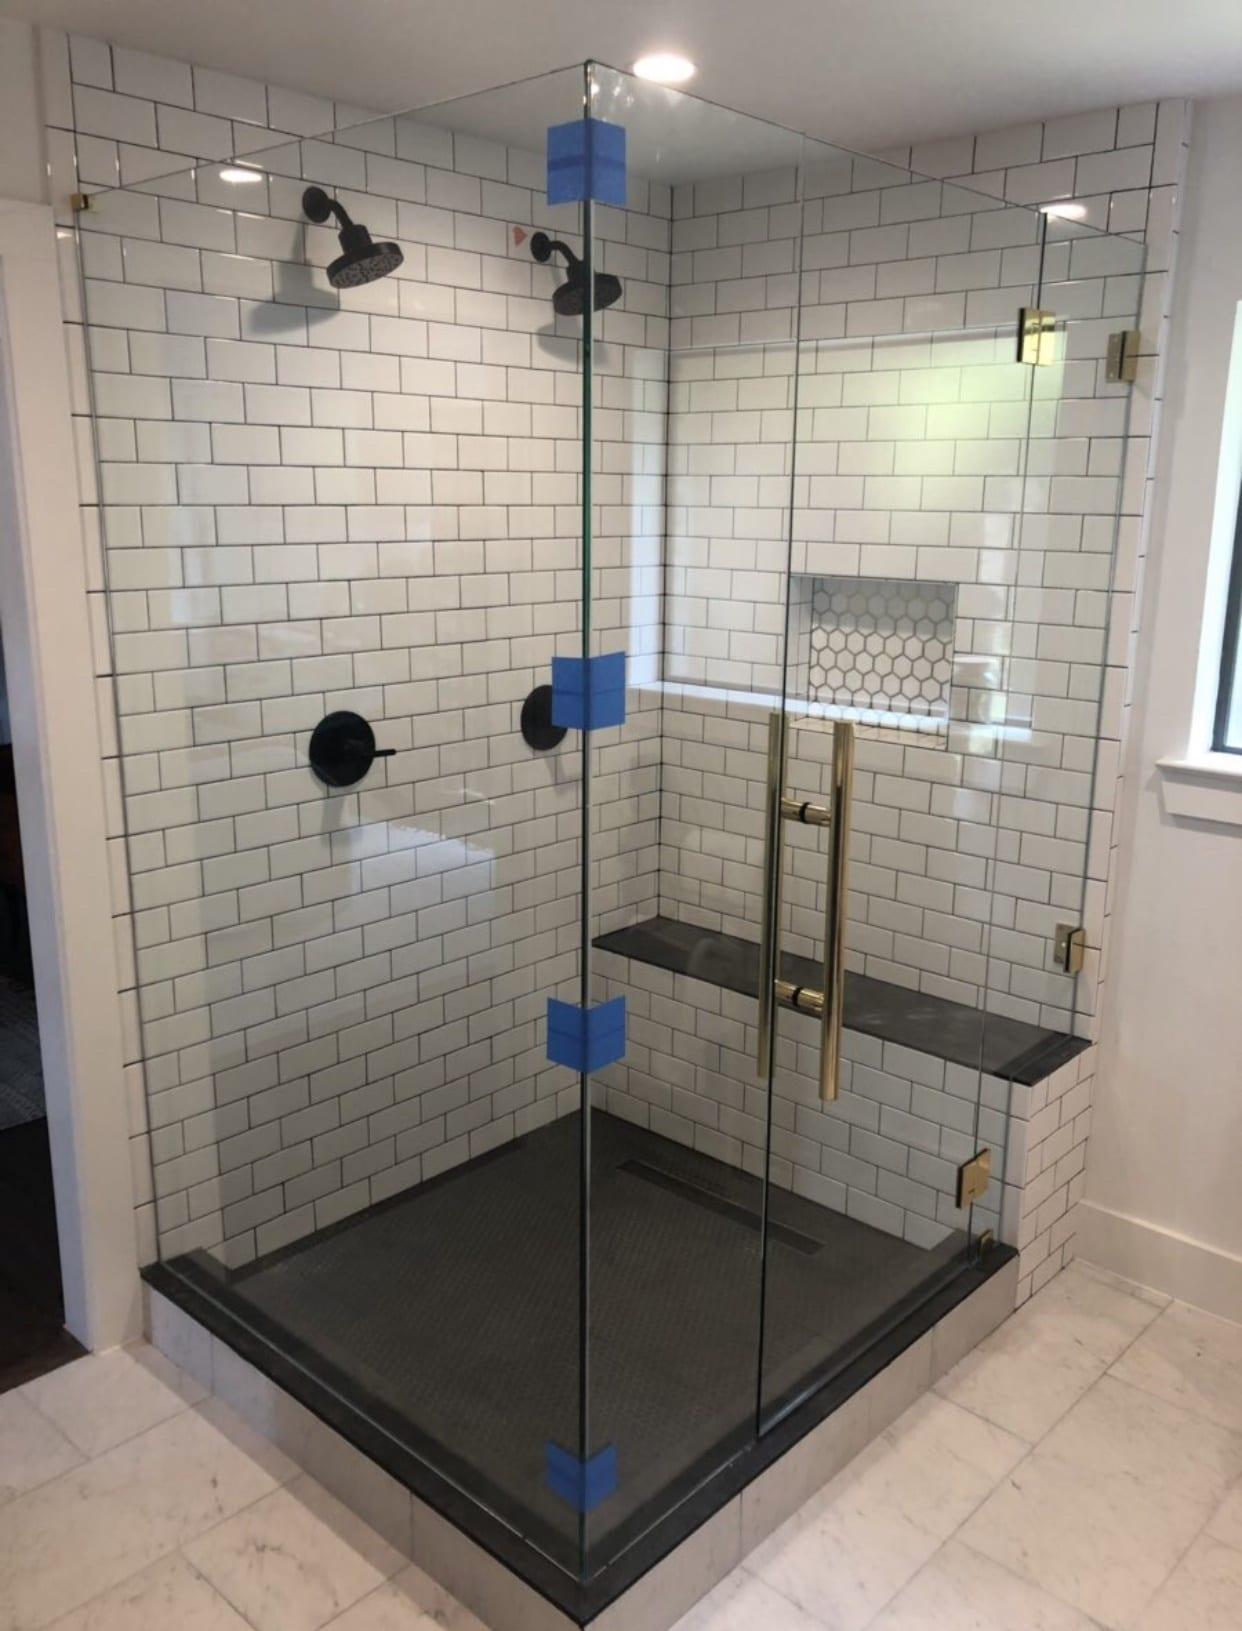 frameless shower doors img 2173 custom bathroom mirrors and decorative glass from Shower Doors of Nashville